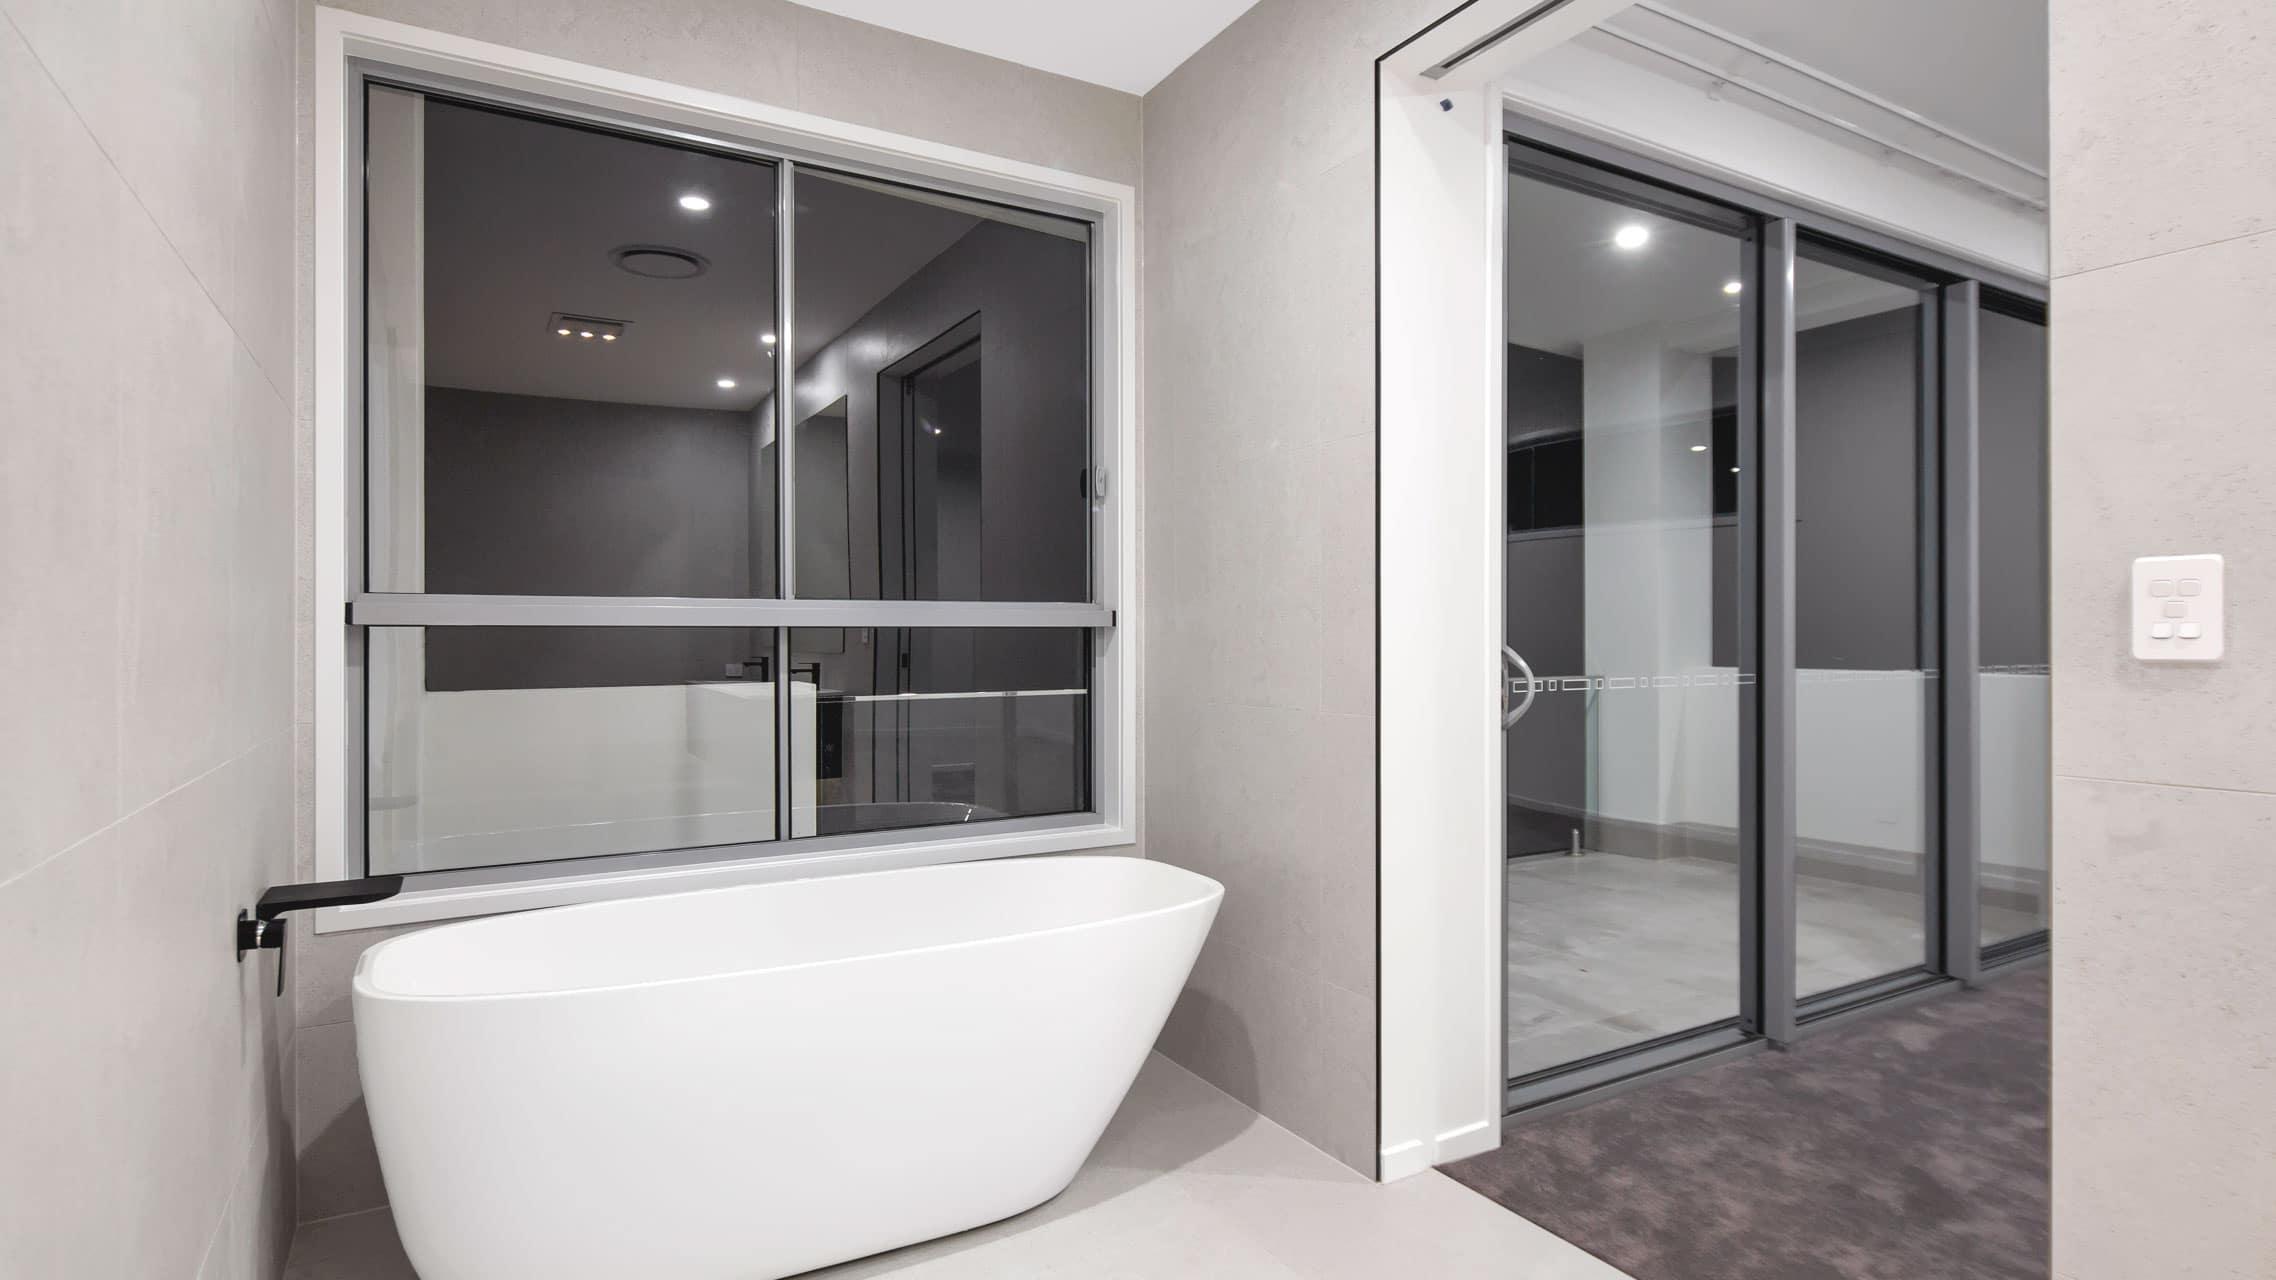 Large Sliding Window next to a bathtub